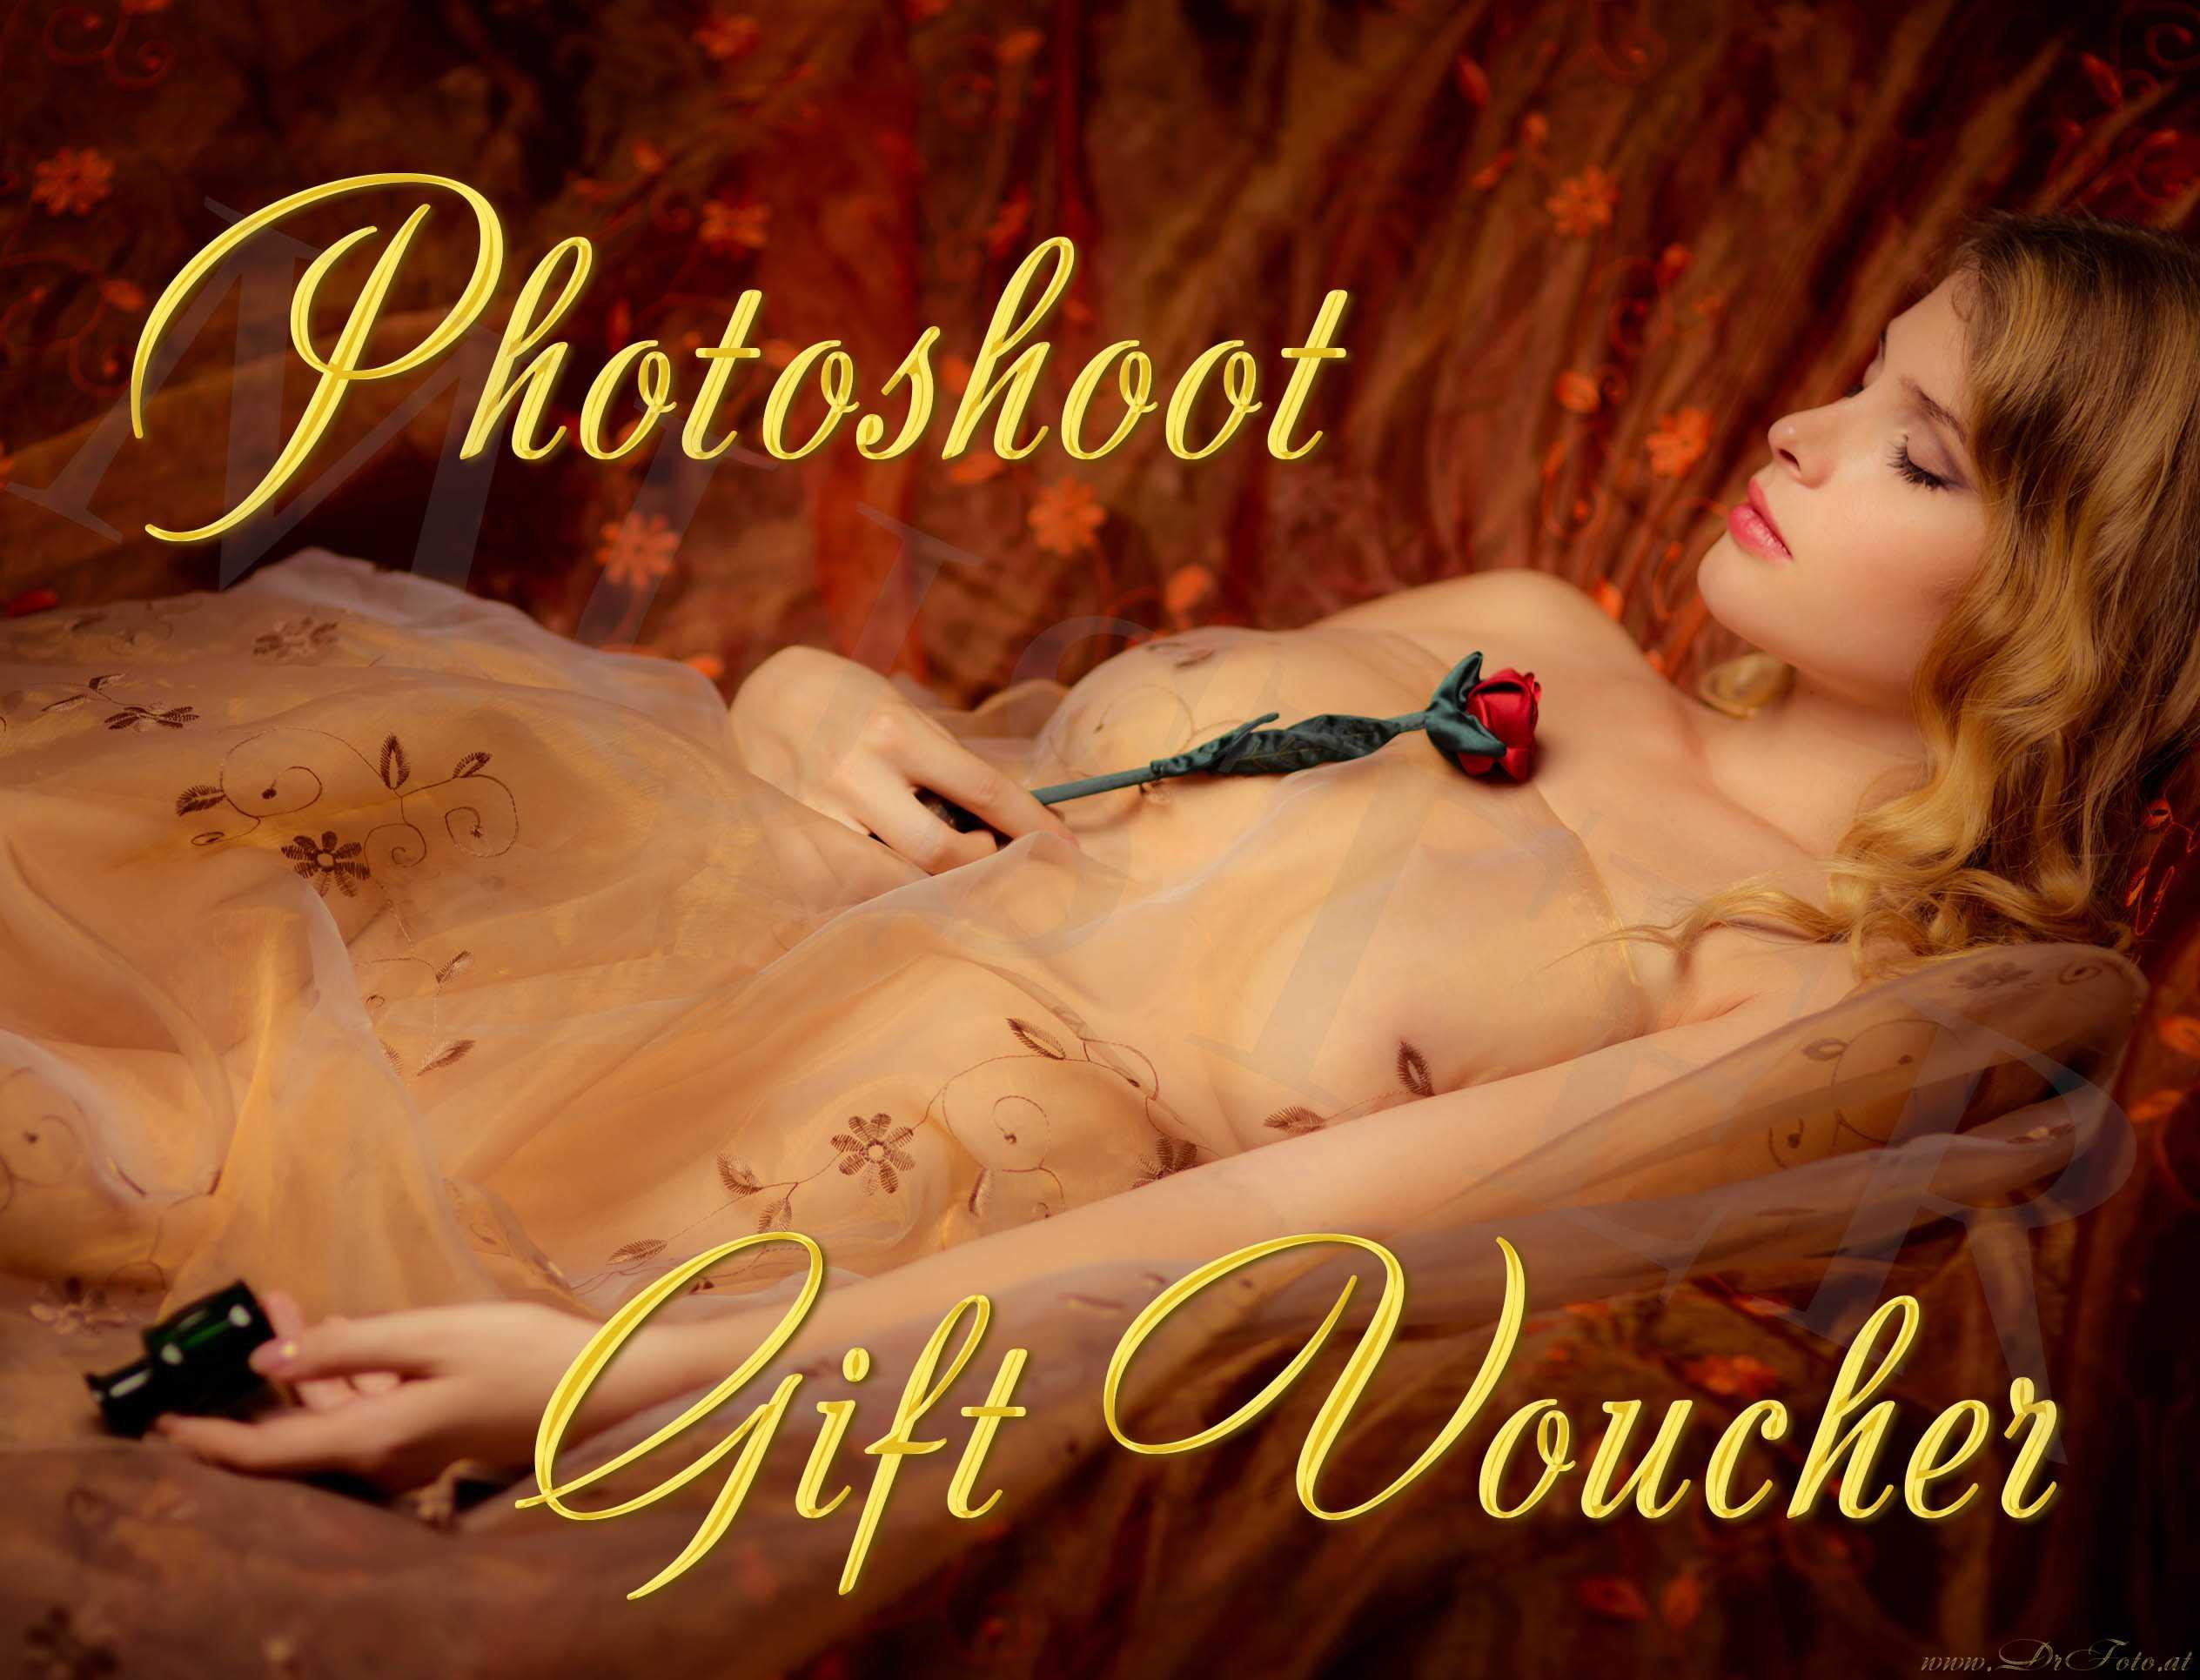 Photoshoot Gift Voucher Front